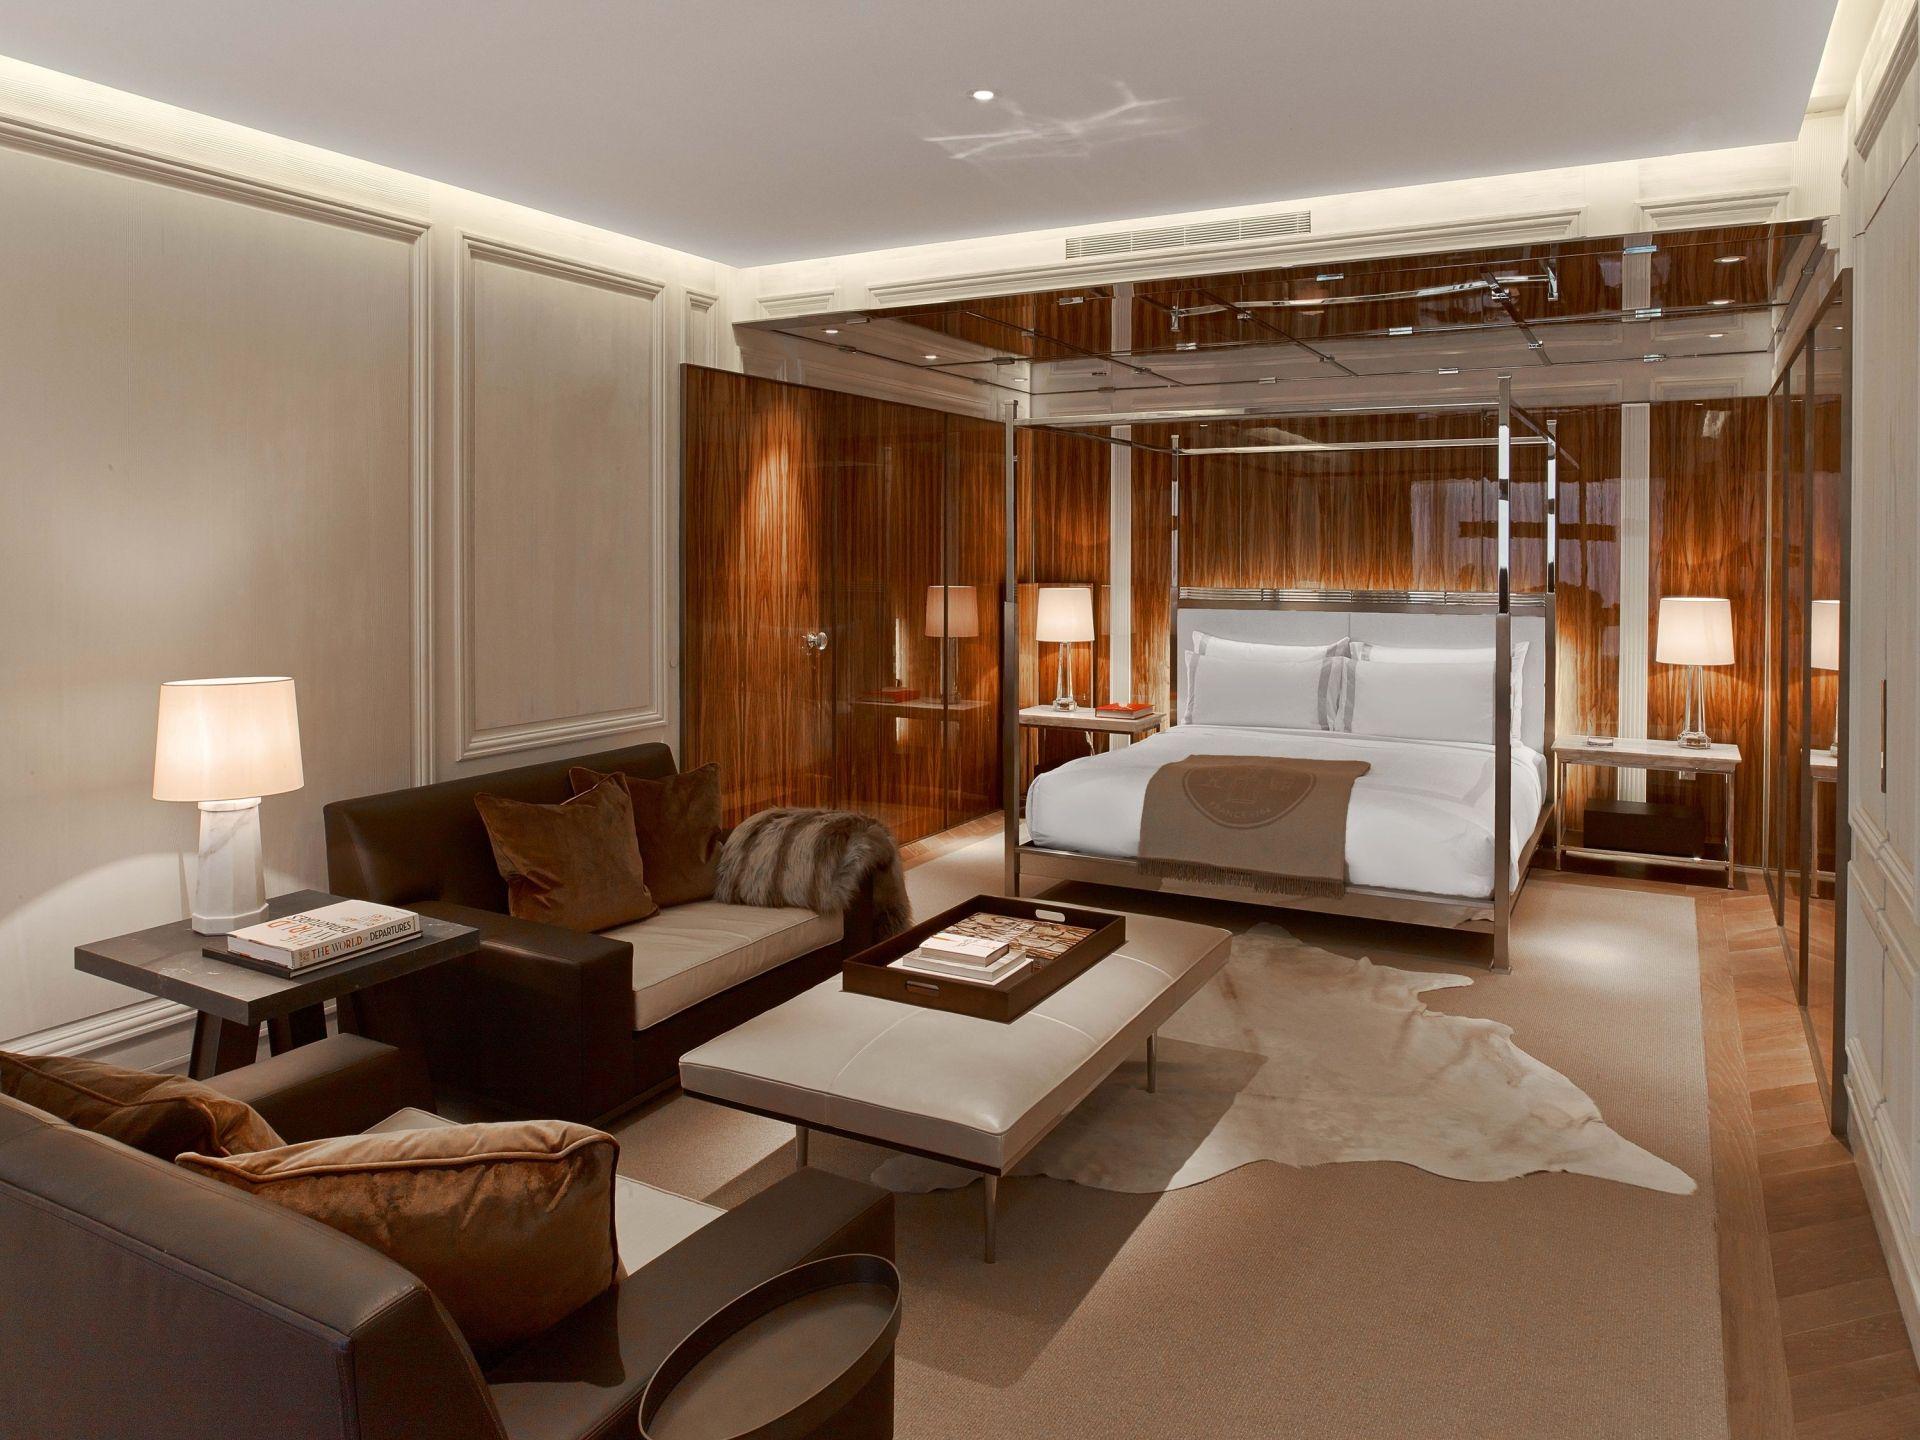 Gilles&Boissier 2015 Baccarat Hotel New York